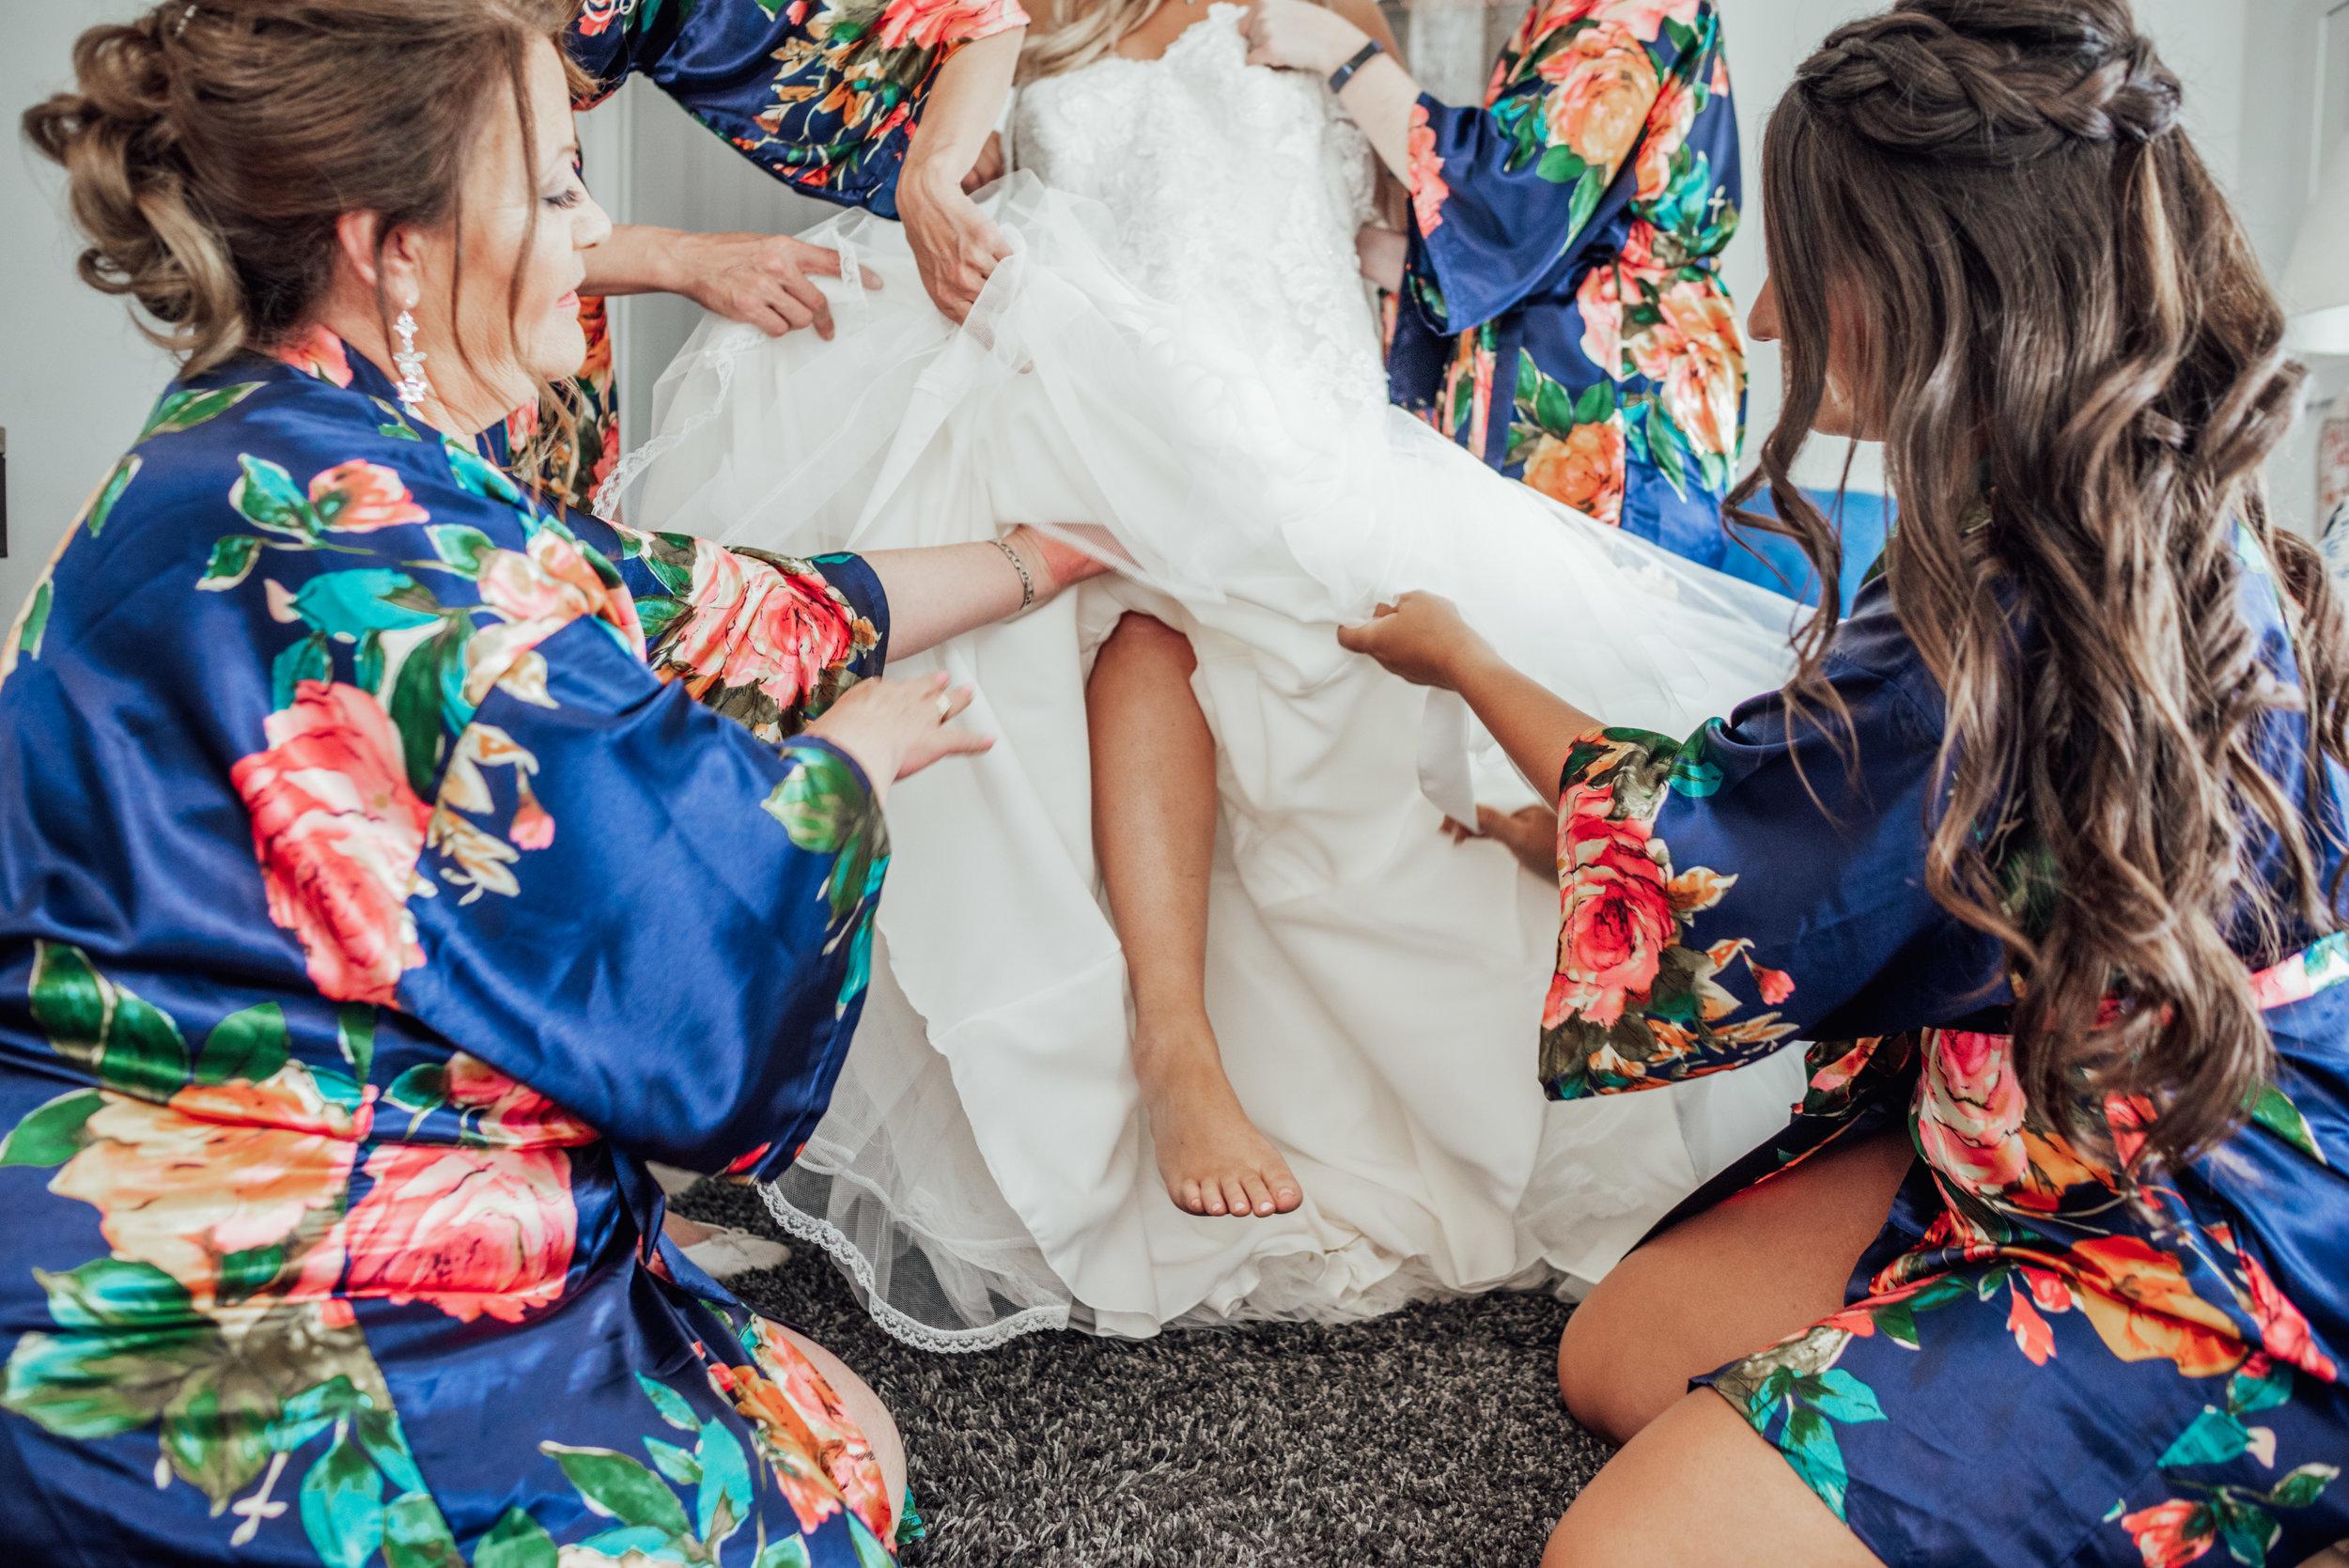 New Jersey Wedding Photographer, Felsberg Photography LBI wedding photography 27.jpg